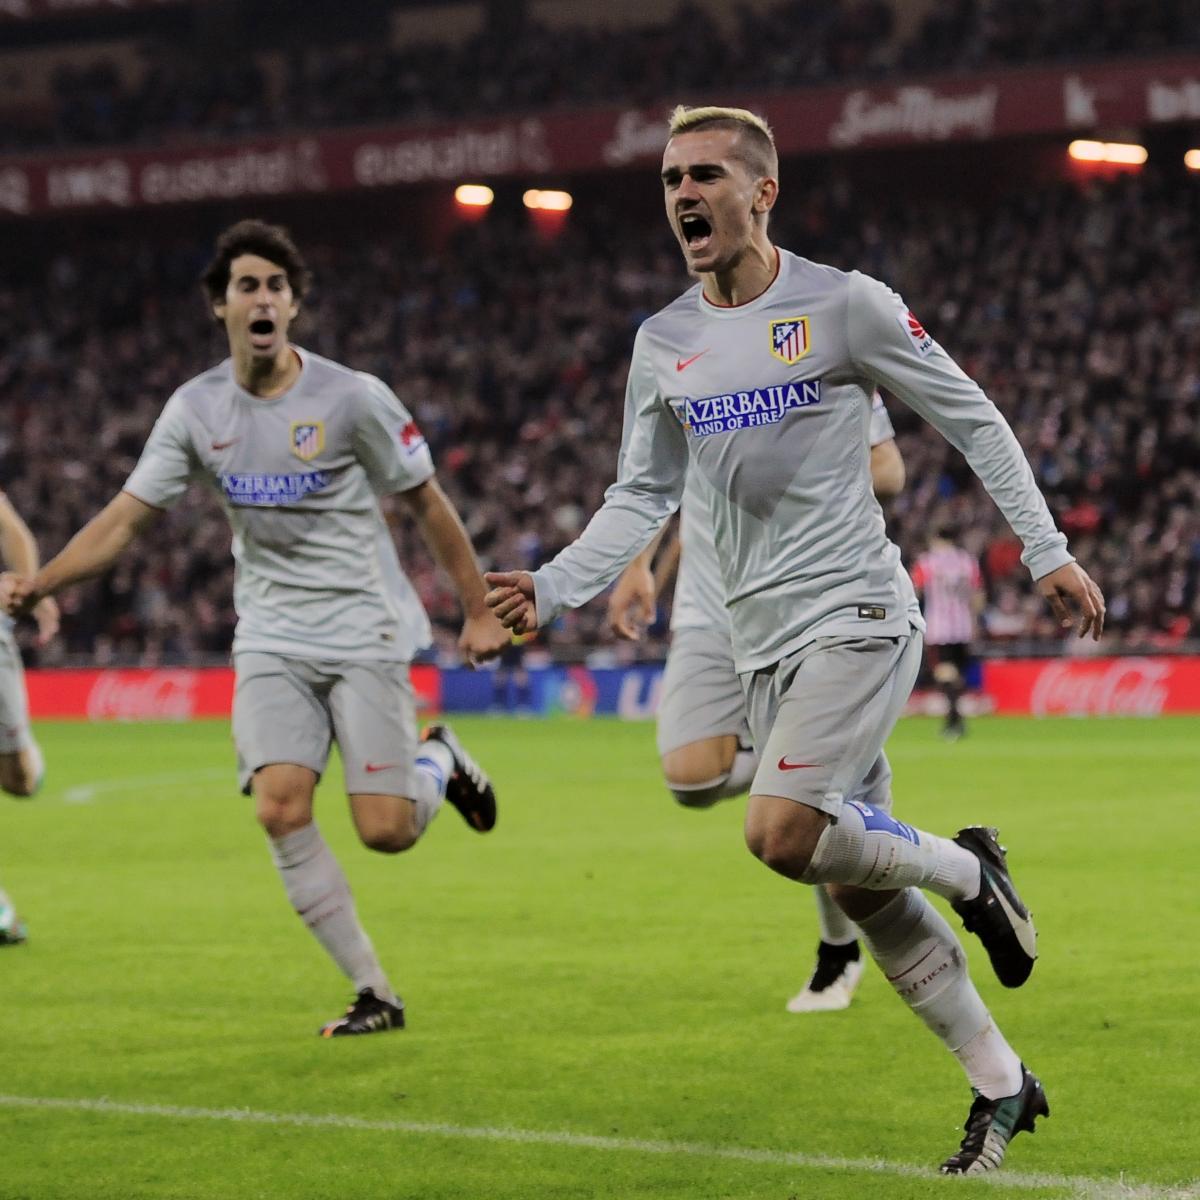 Champions League 2019 Round Of 16 Leg 2 Live Stream Tv: Bayer Leverkusen Vs. Atletico Madrid: Team News, Preview